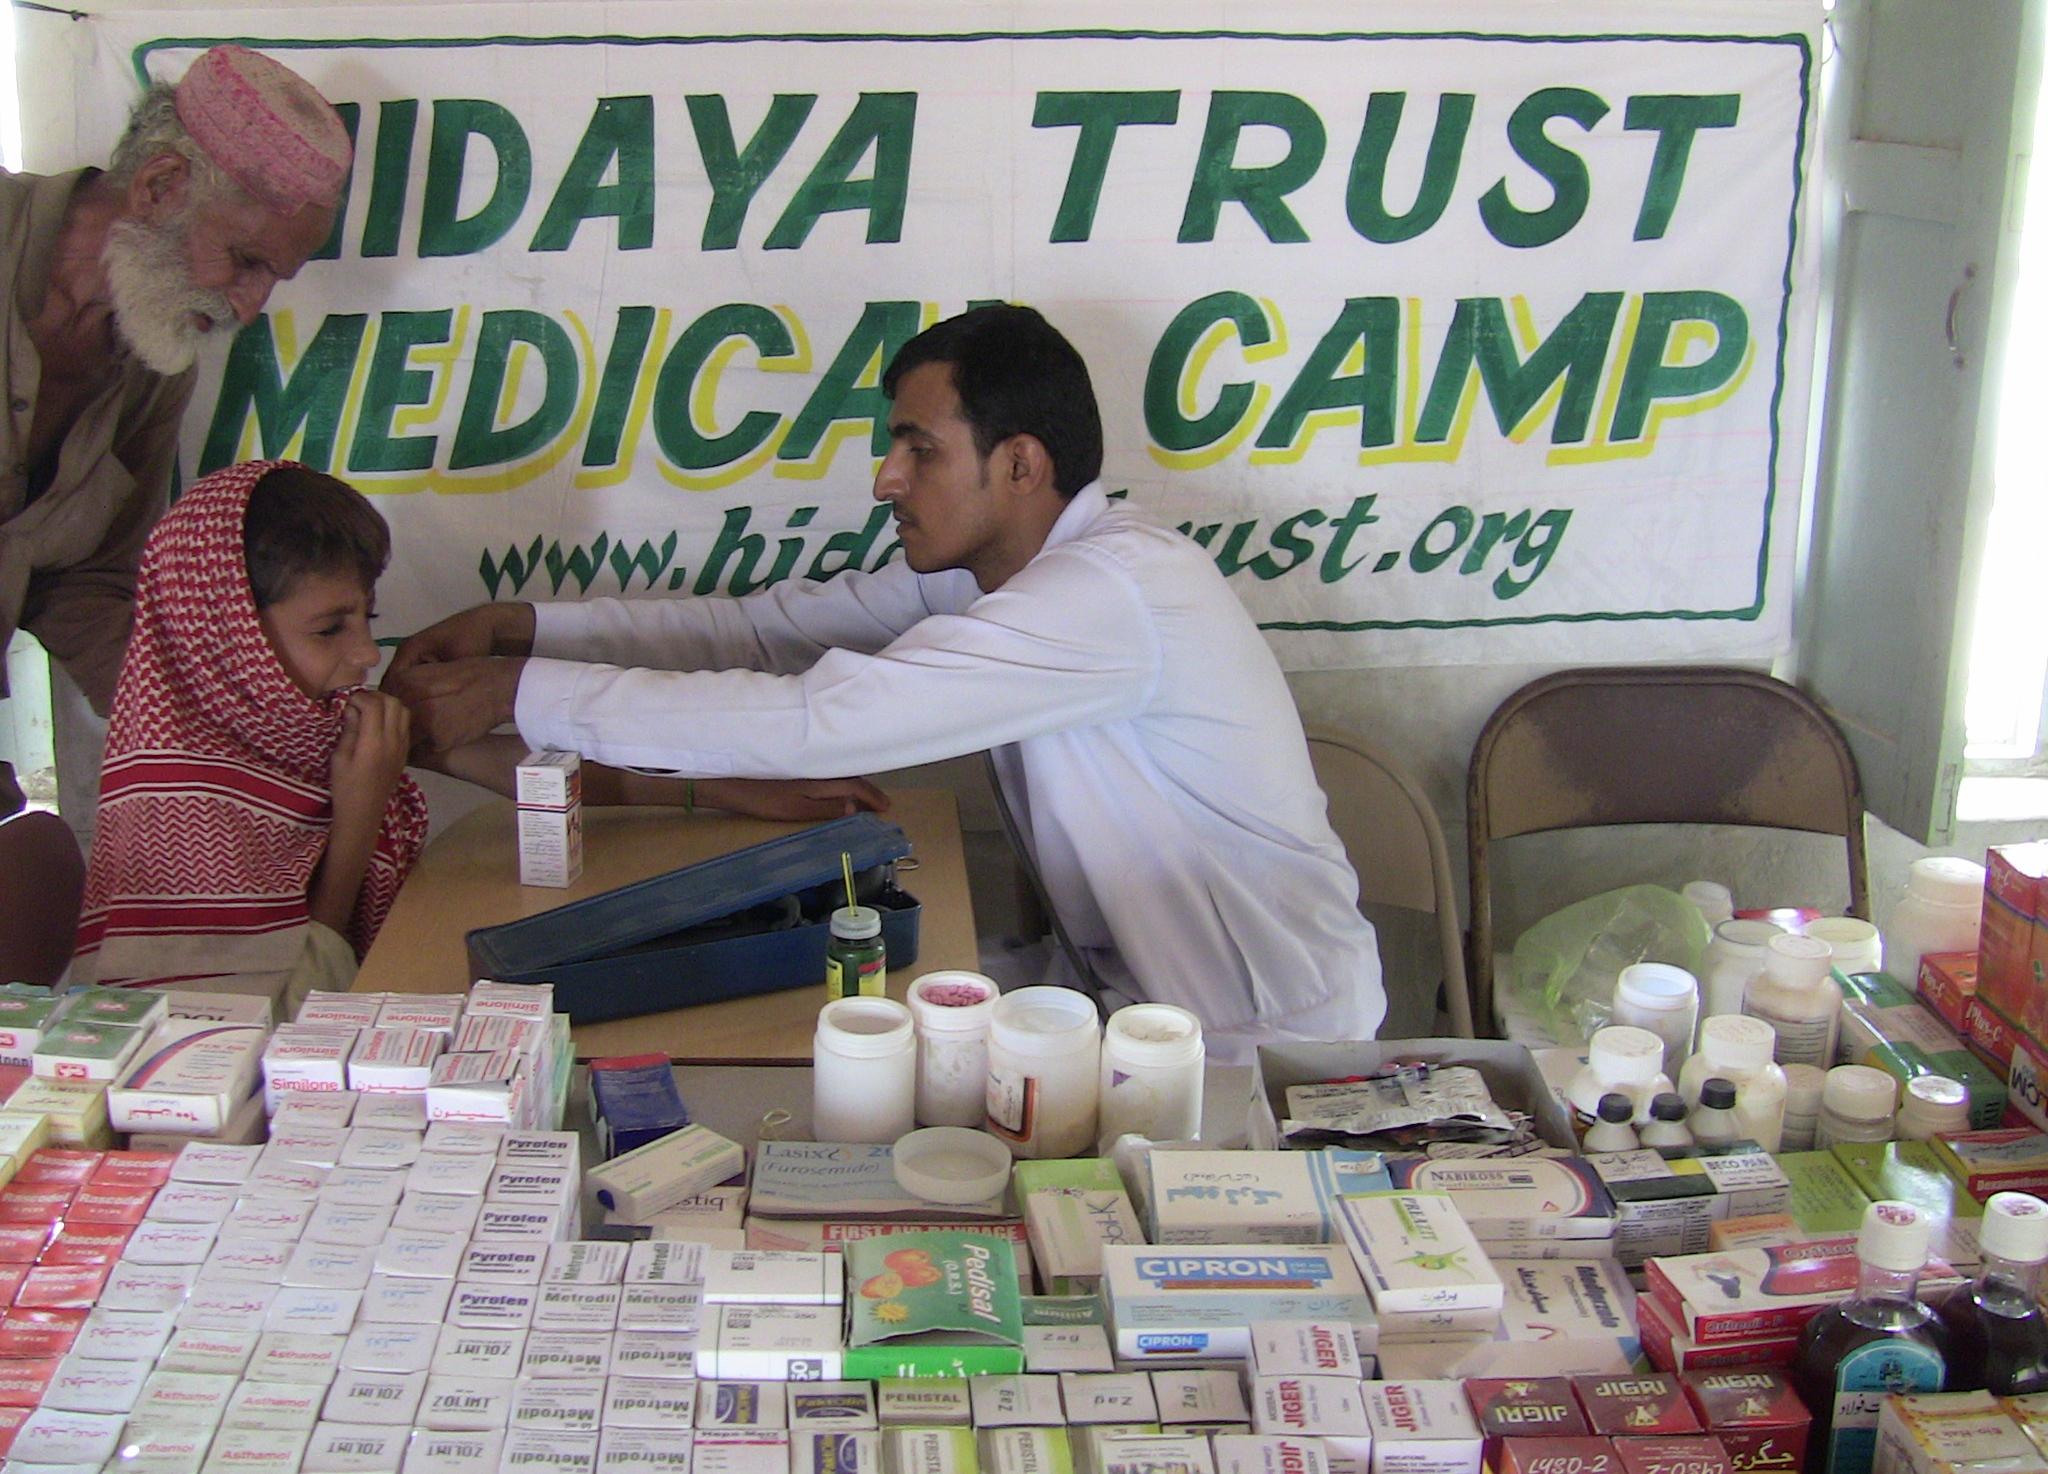 20110720_Sldo_Hcp_Aaqureshi_Bdsanjrani_Sind_Shp_Villrahimabad_Balochform_Medicalcamp_52